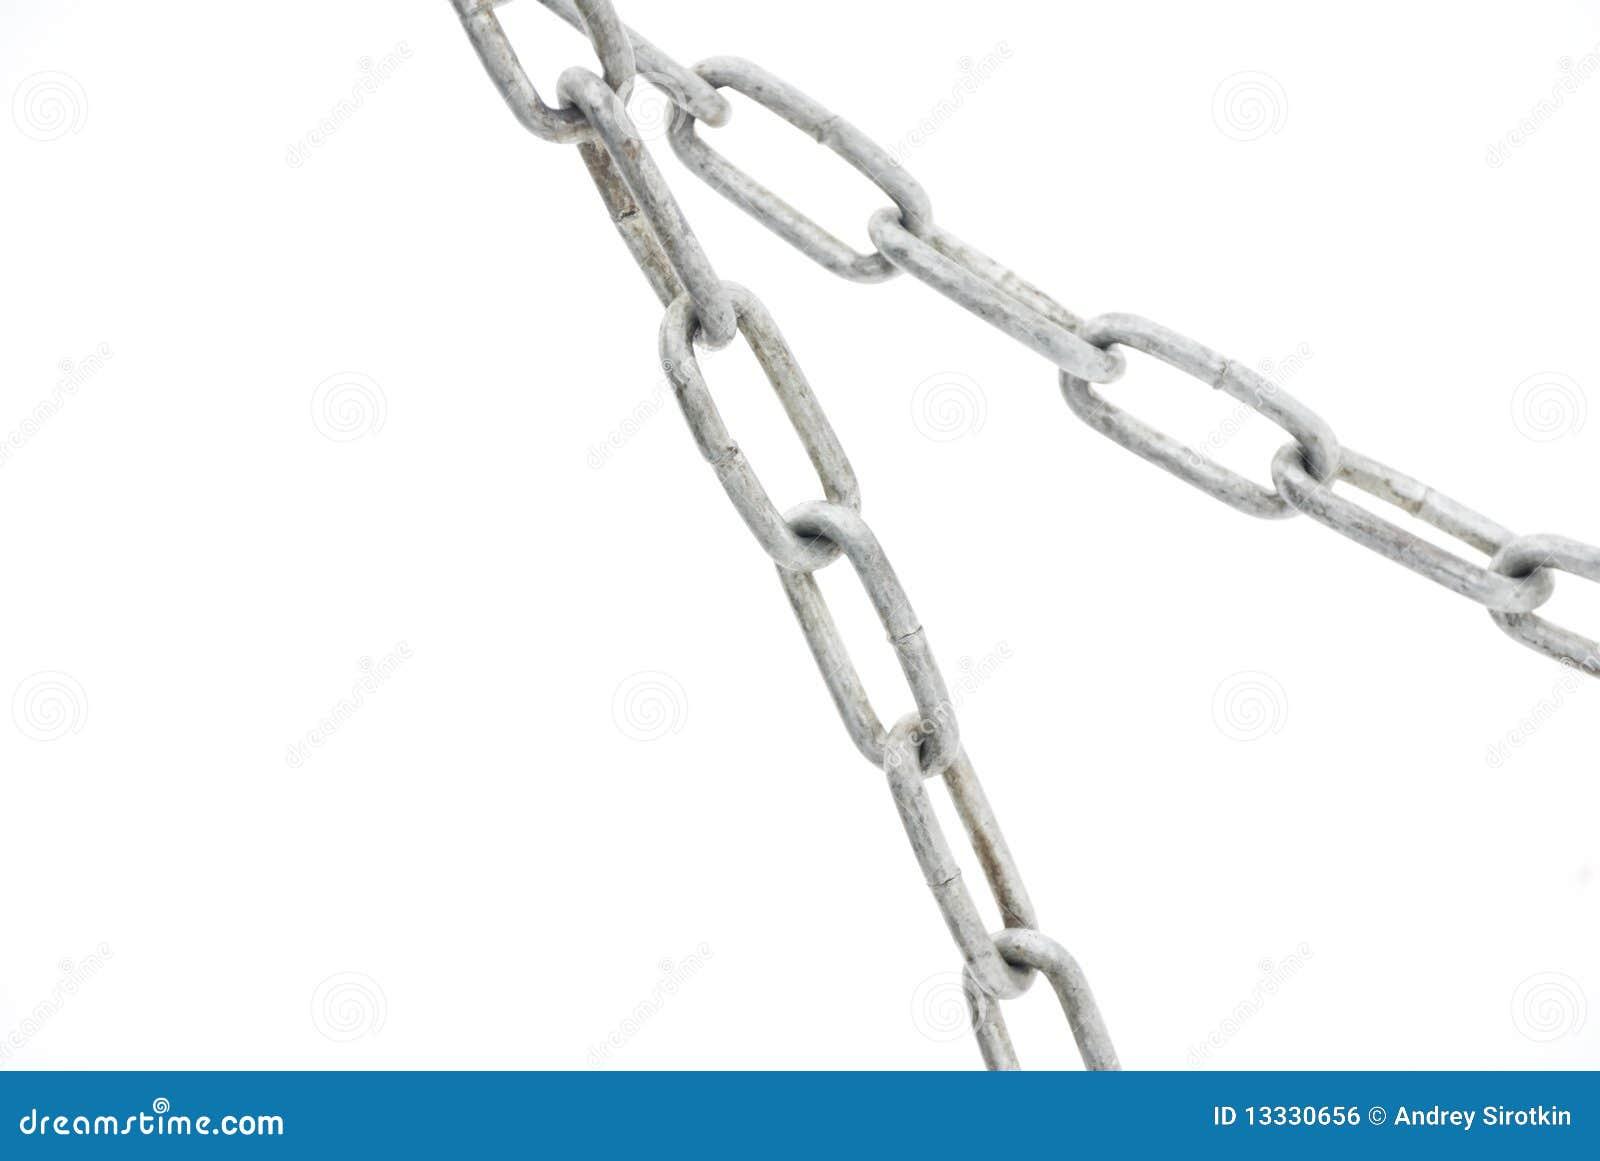 Obwodu metal